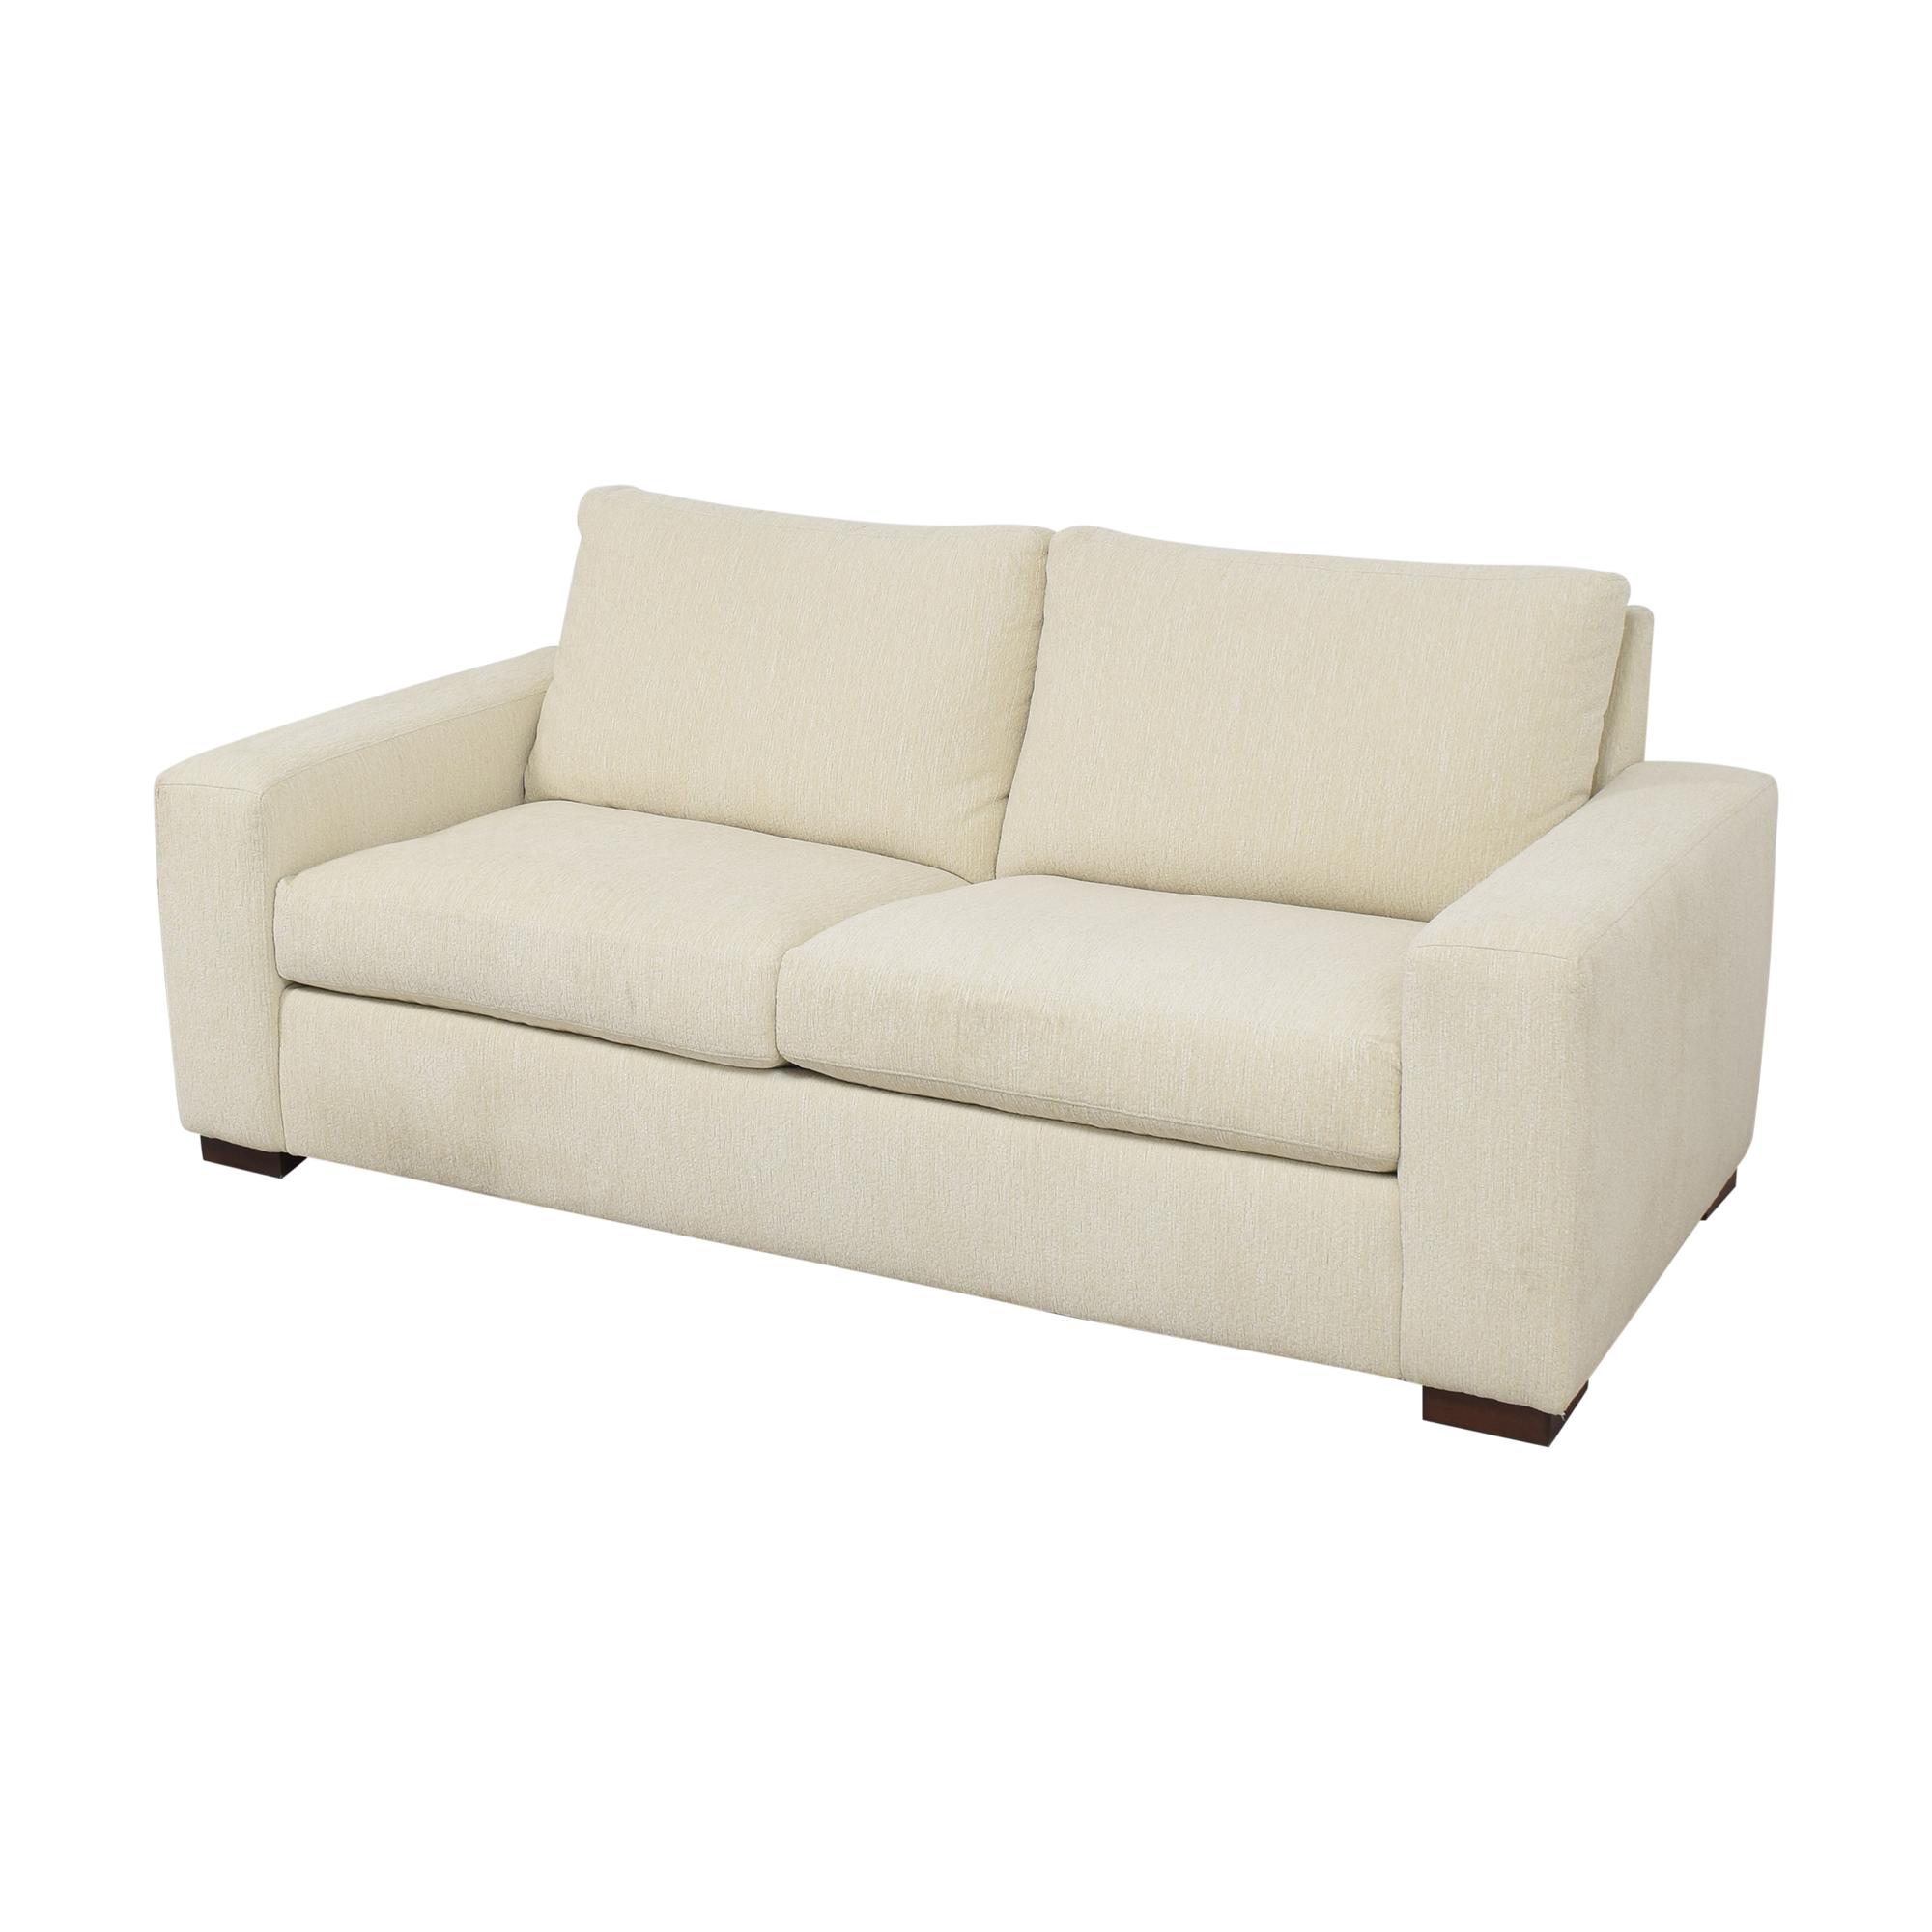 BenchMade Modern BenchMade Modern Couch Potato Sofa Classic Sofas